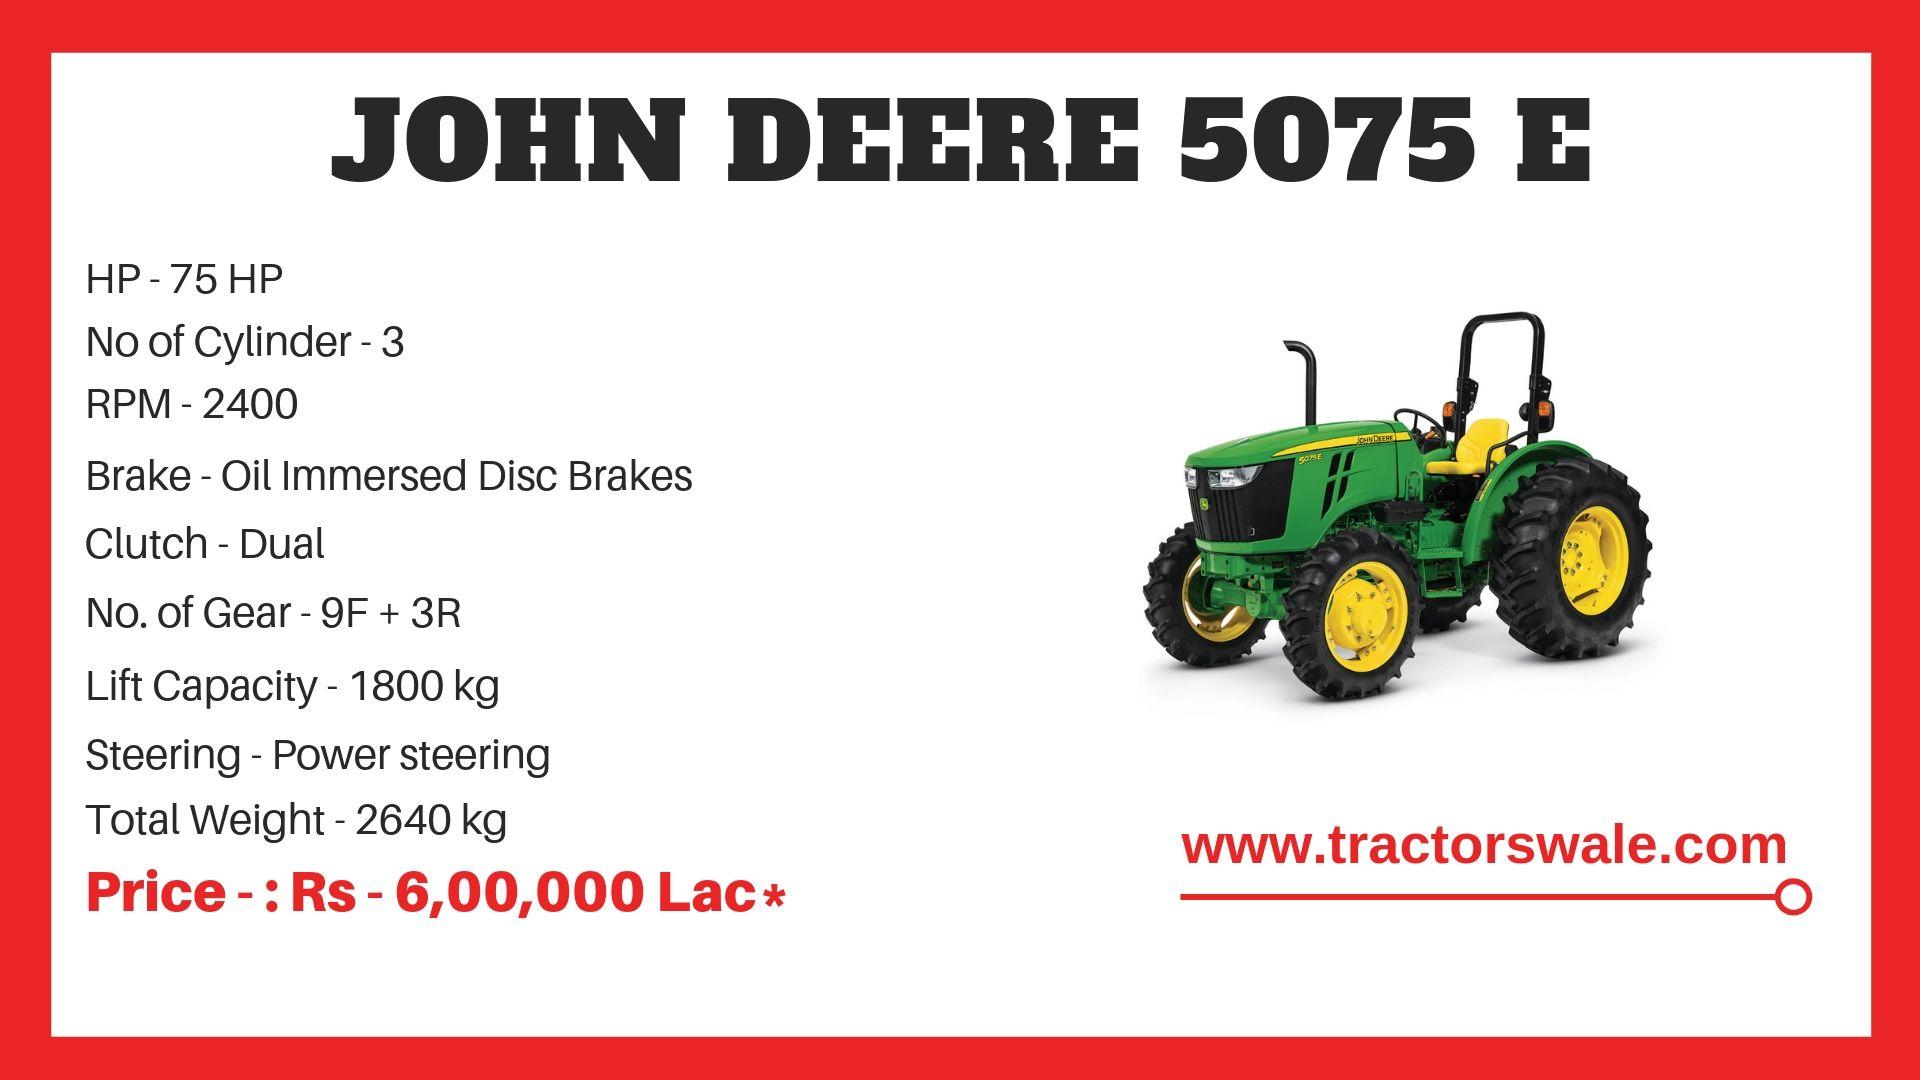 John Deere 5075 E Tractor Specifications